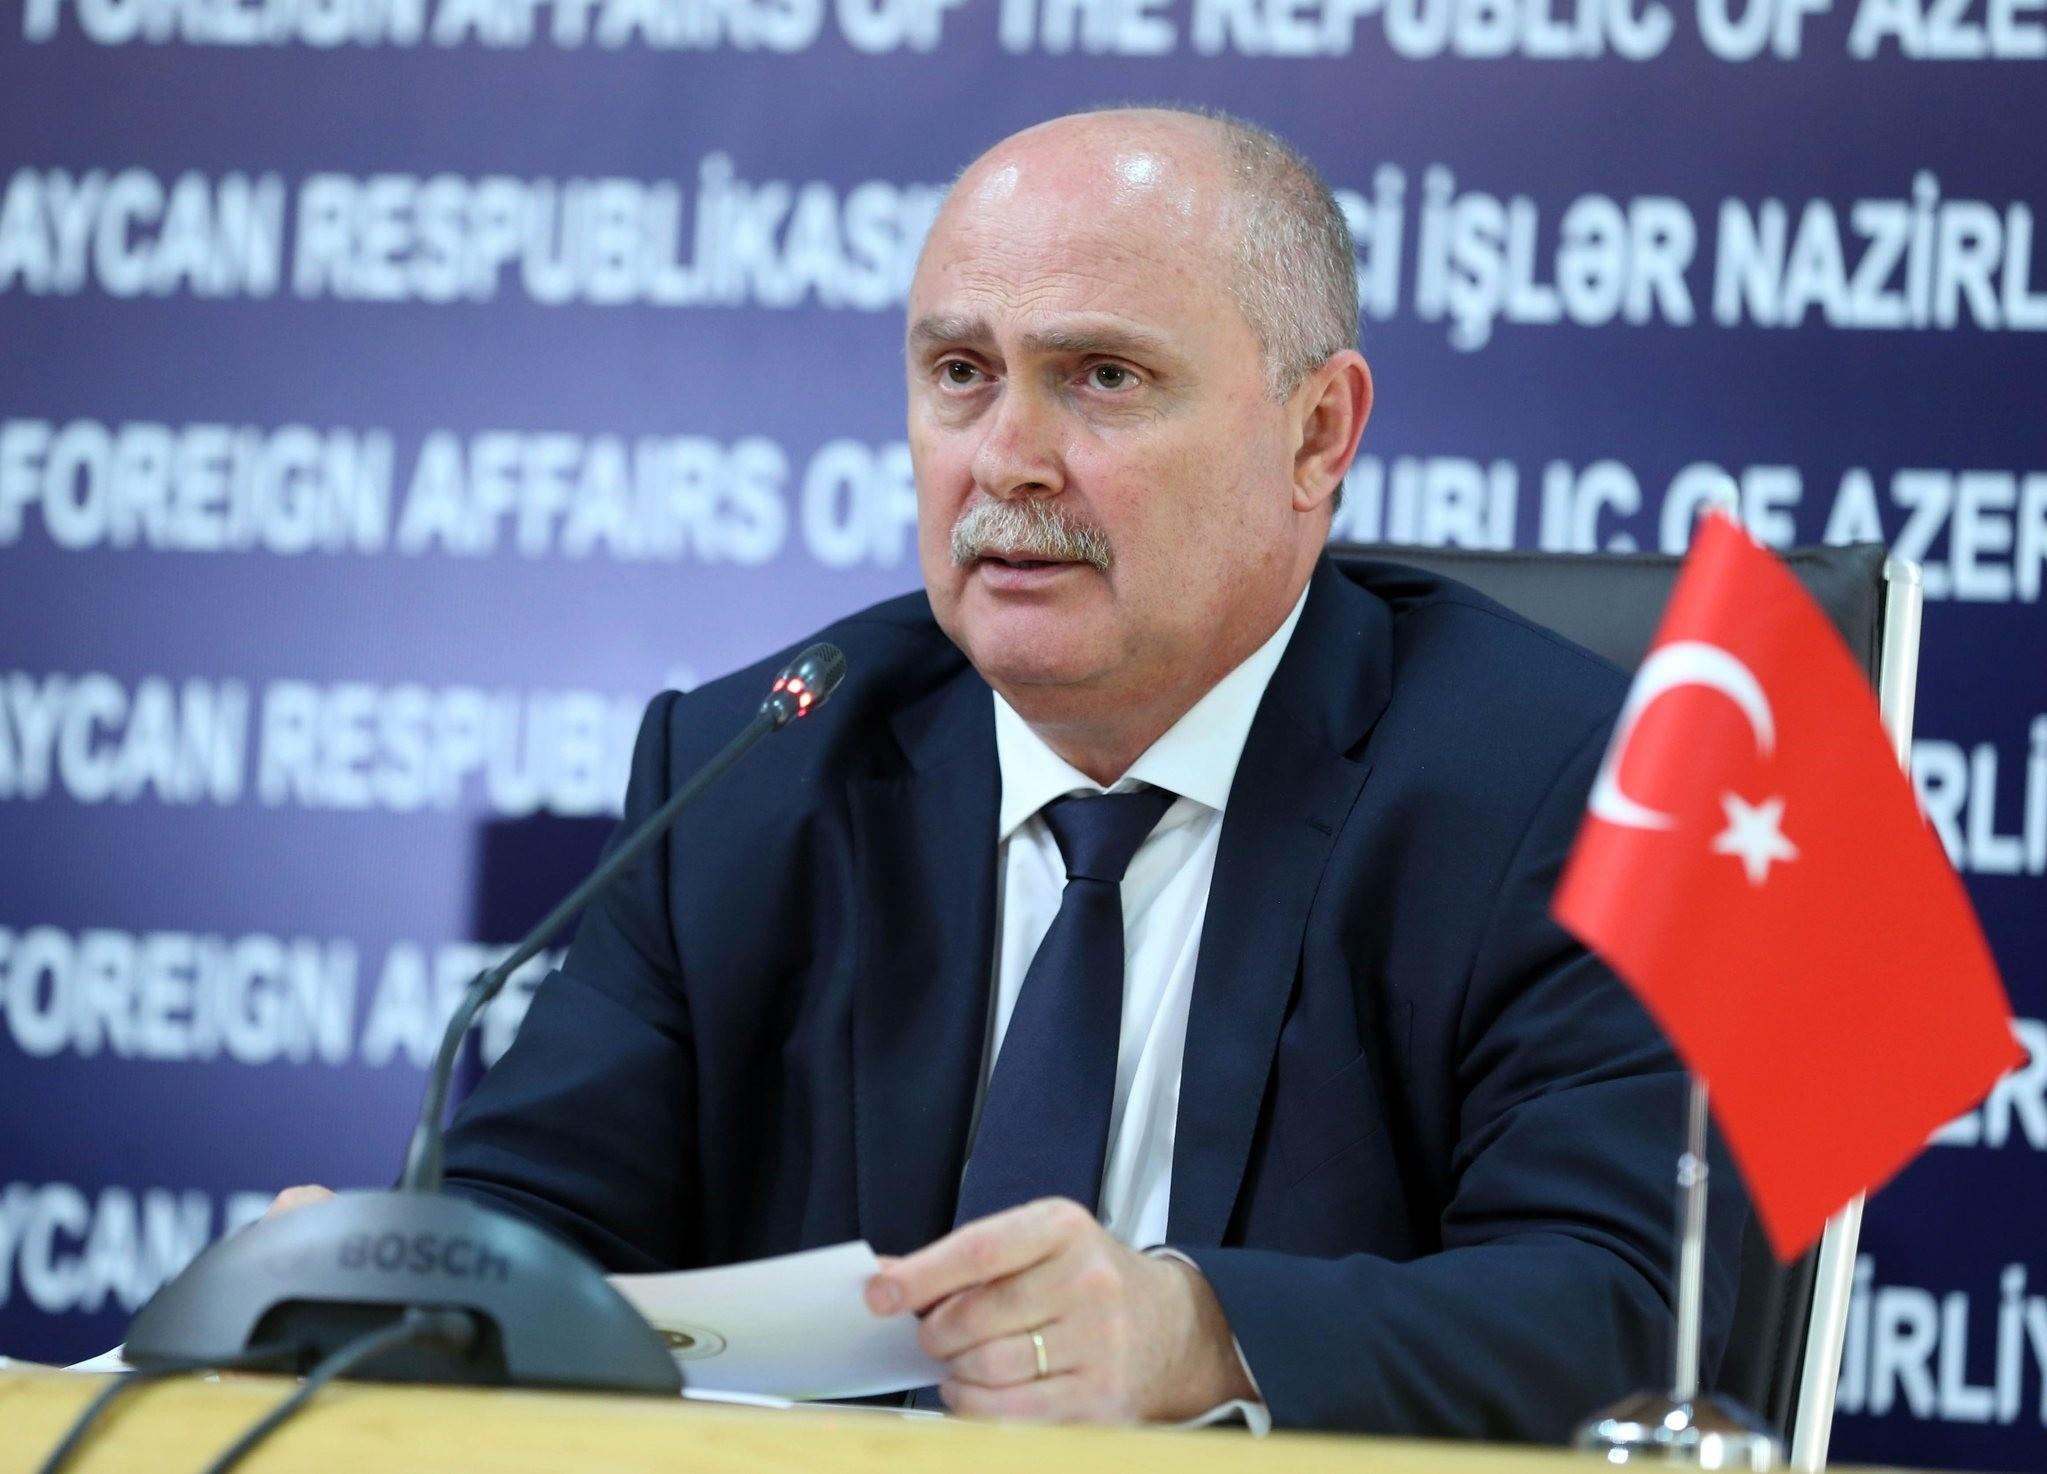 Feridun Sinirliou011flu, Undersecretary of the Ministry of Foreign Affairs  AA photo